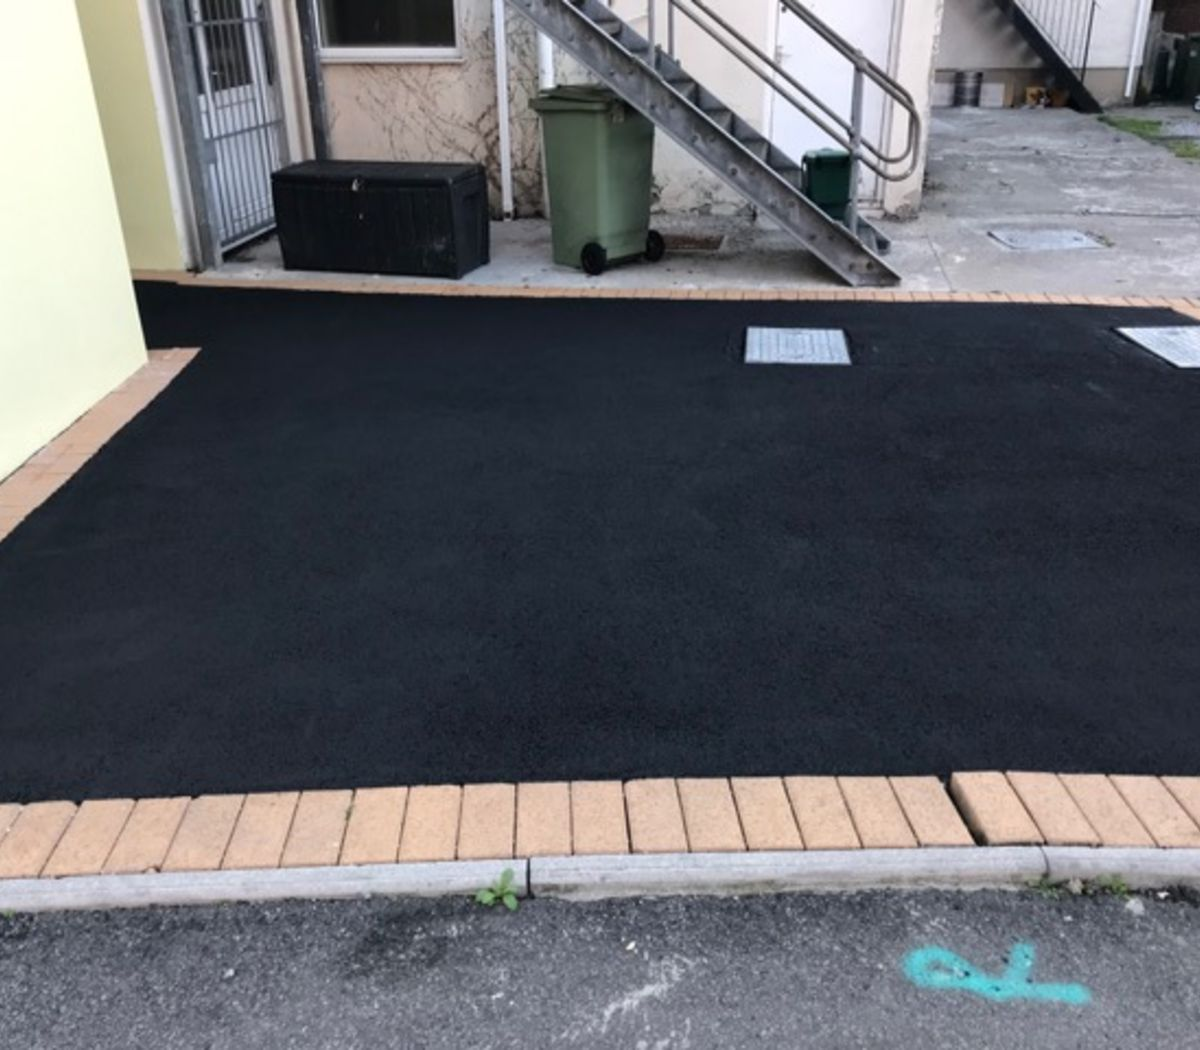 driveway cleaning company swansea llanelli